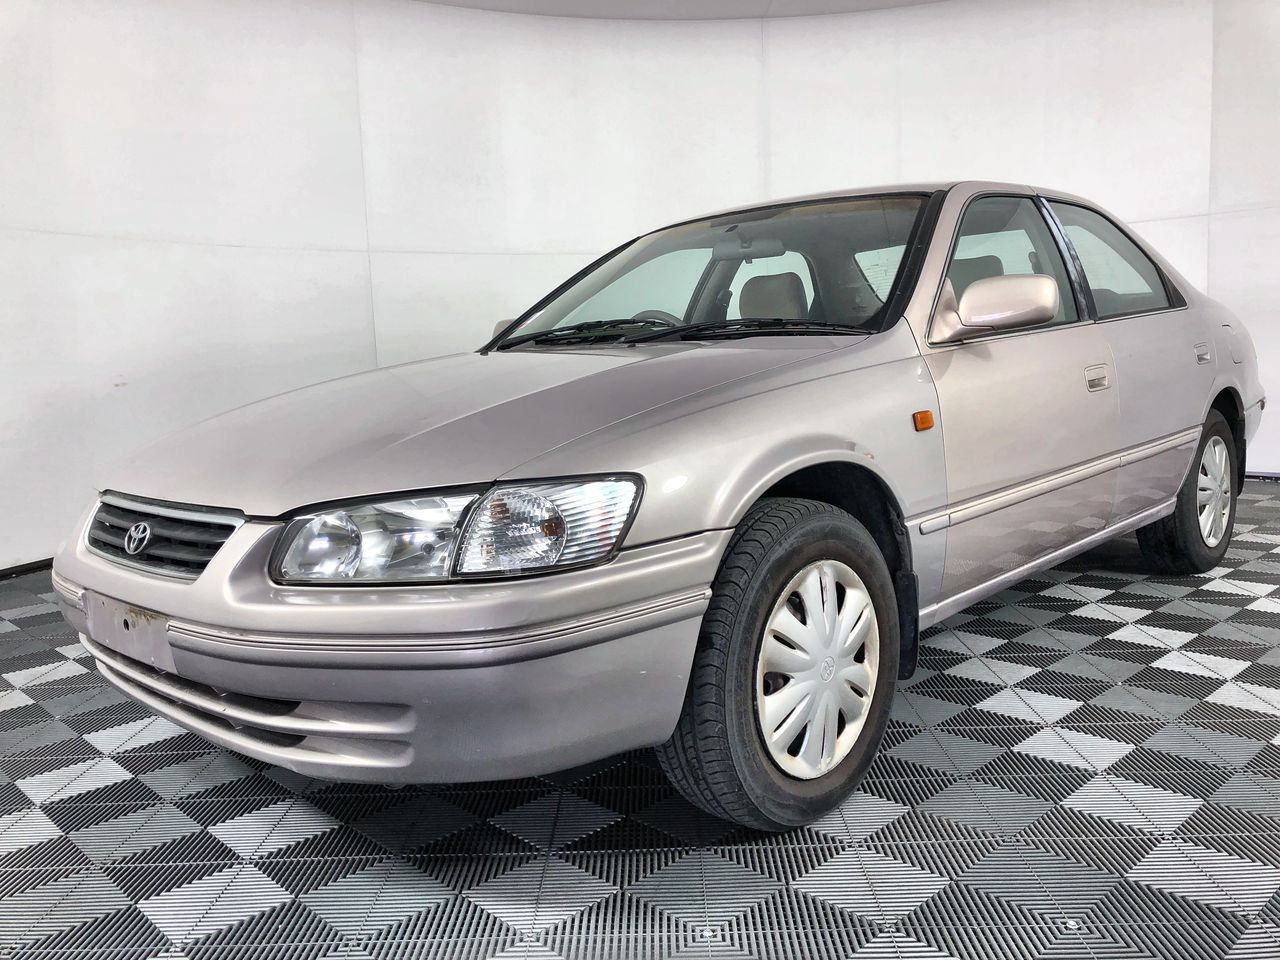 2001 Toyota Camry CSI SXV20R Automatic Sedan (WOVR)